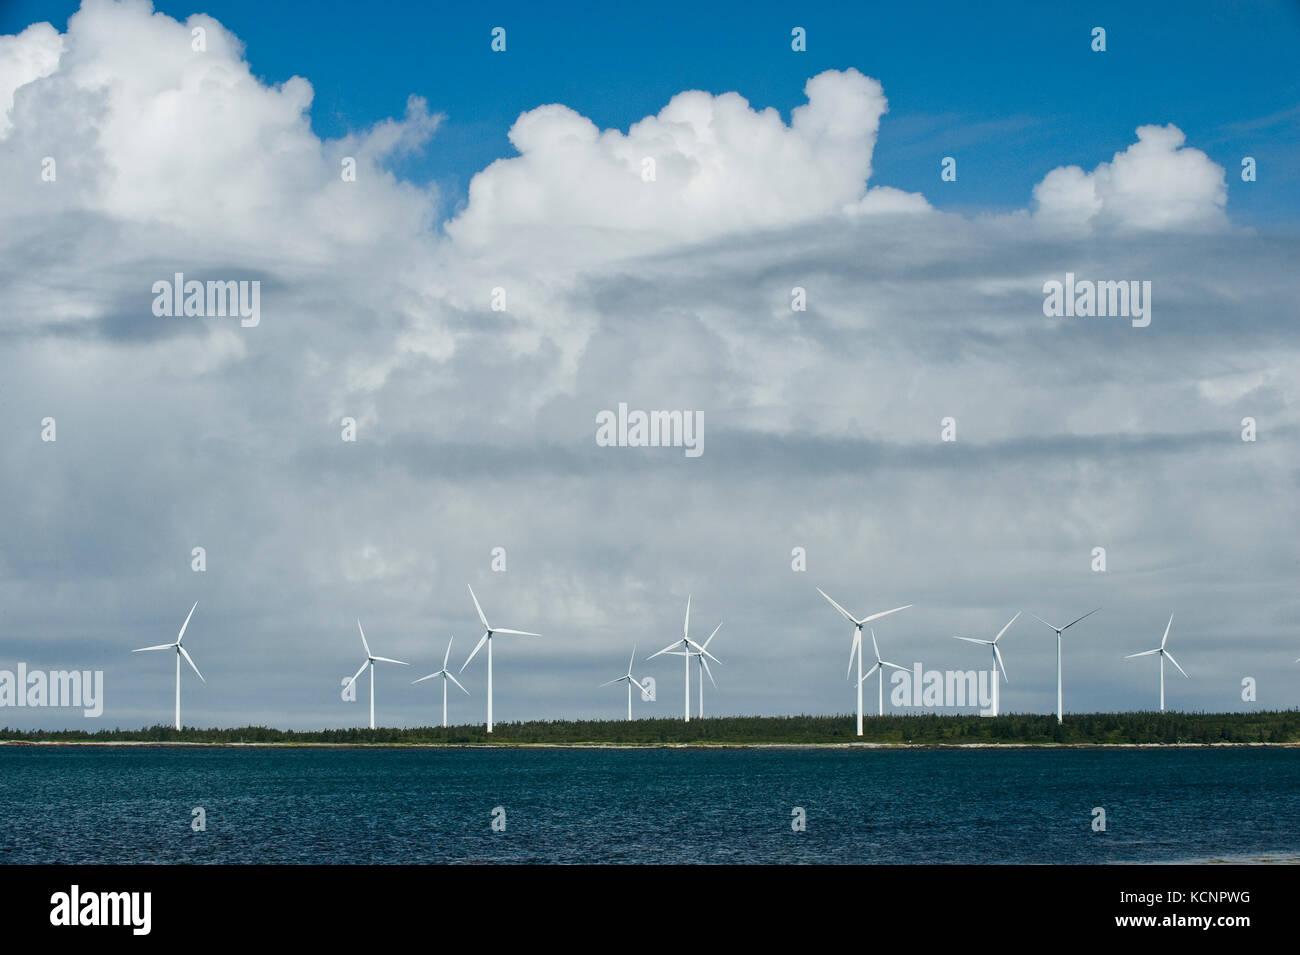 wind turbines along the Bay of Fundy near Pubnico, Nova Scotia - Stock Image